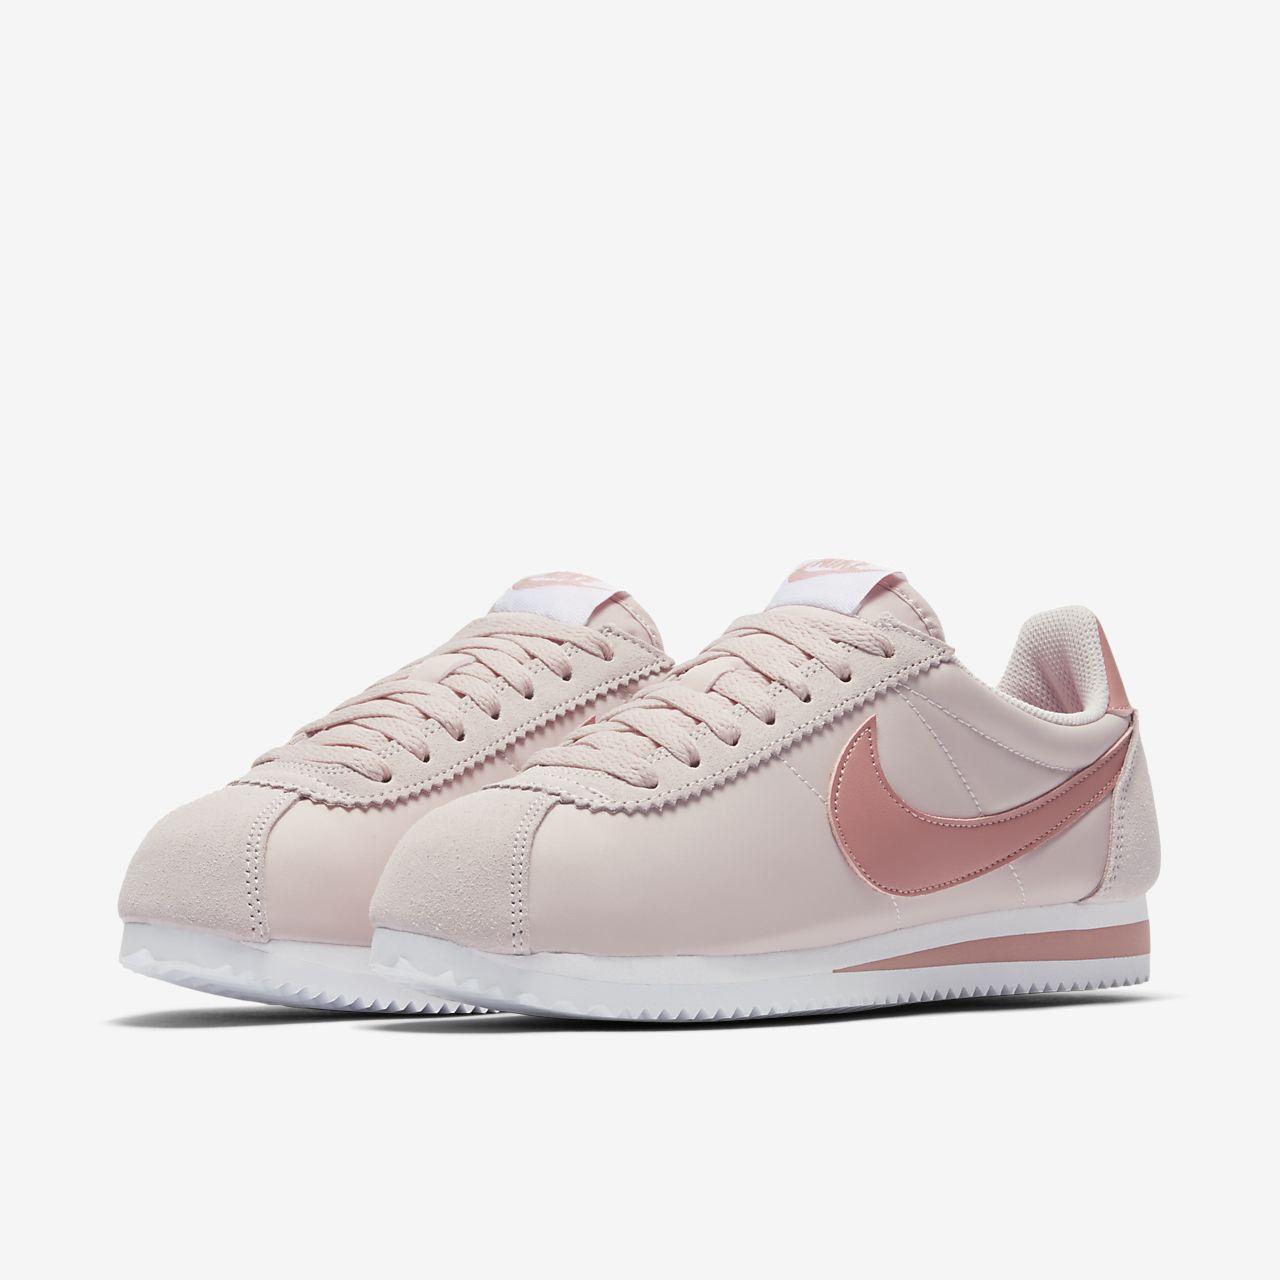 d290a0dbe9 ... czech nike classic cortez nylon womens shoe 65655 38bee ...